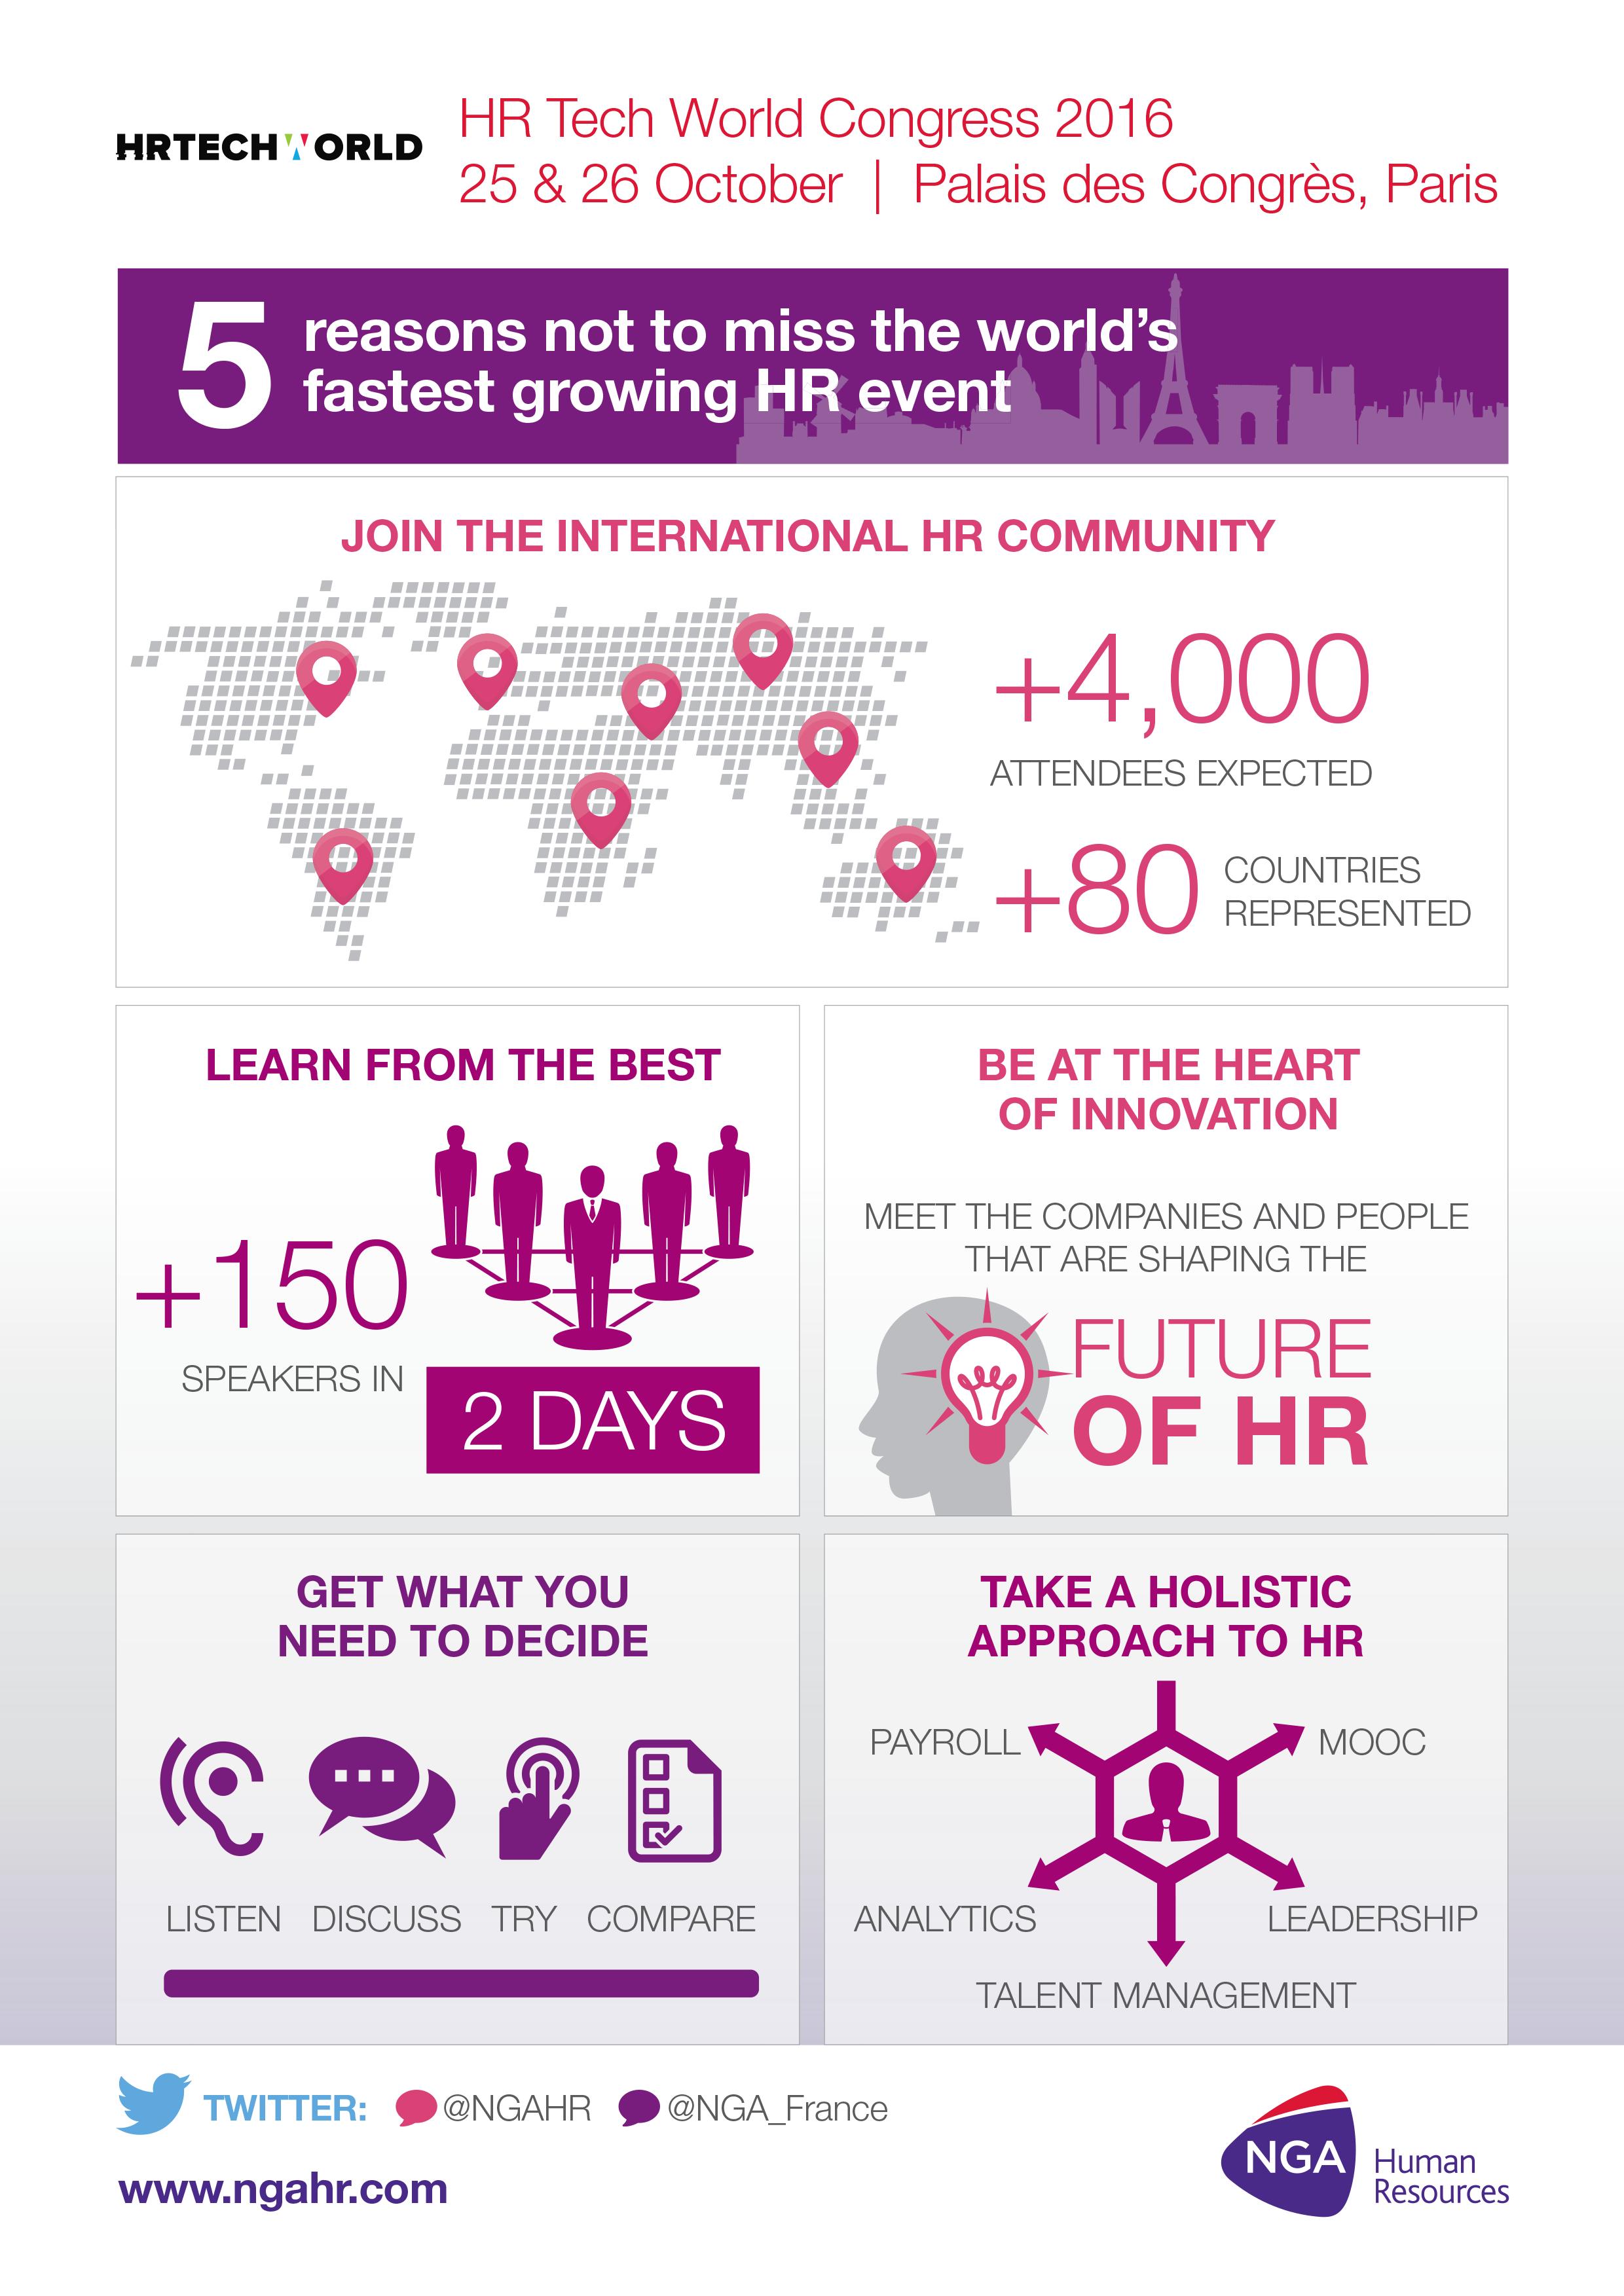 hr-tech-2016-5-good-reasons-en